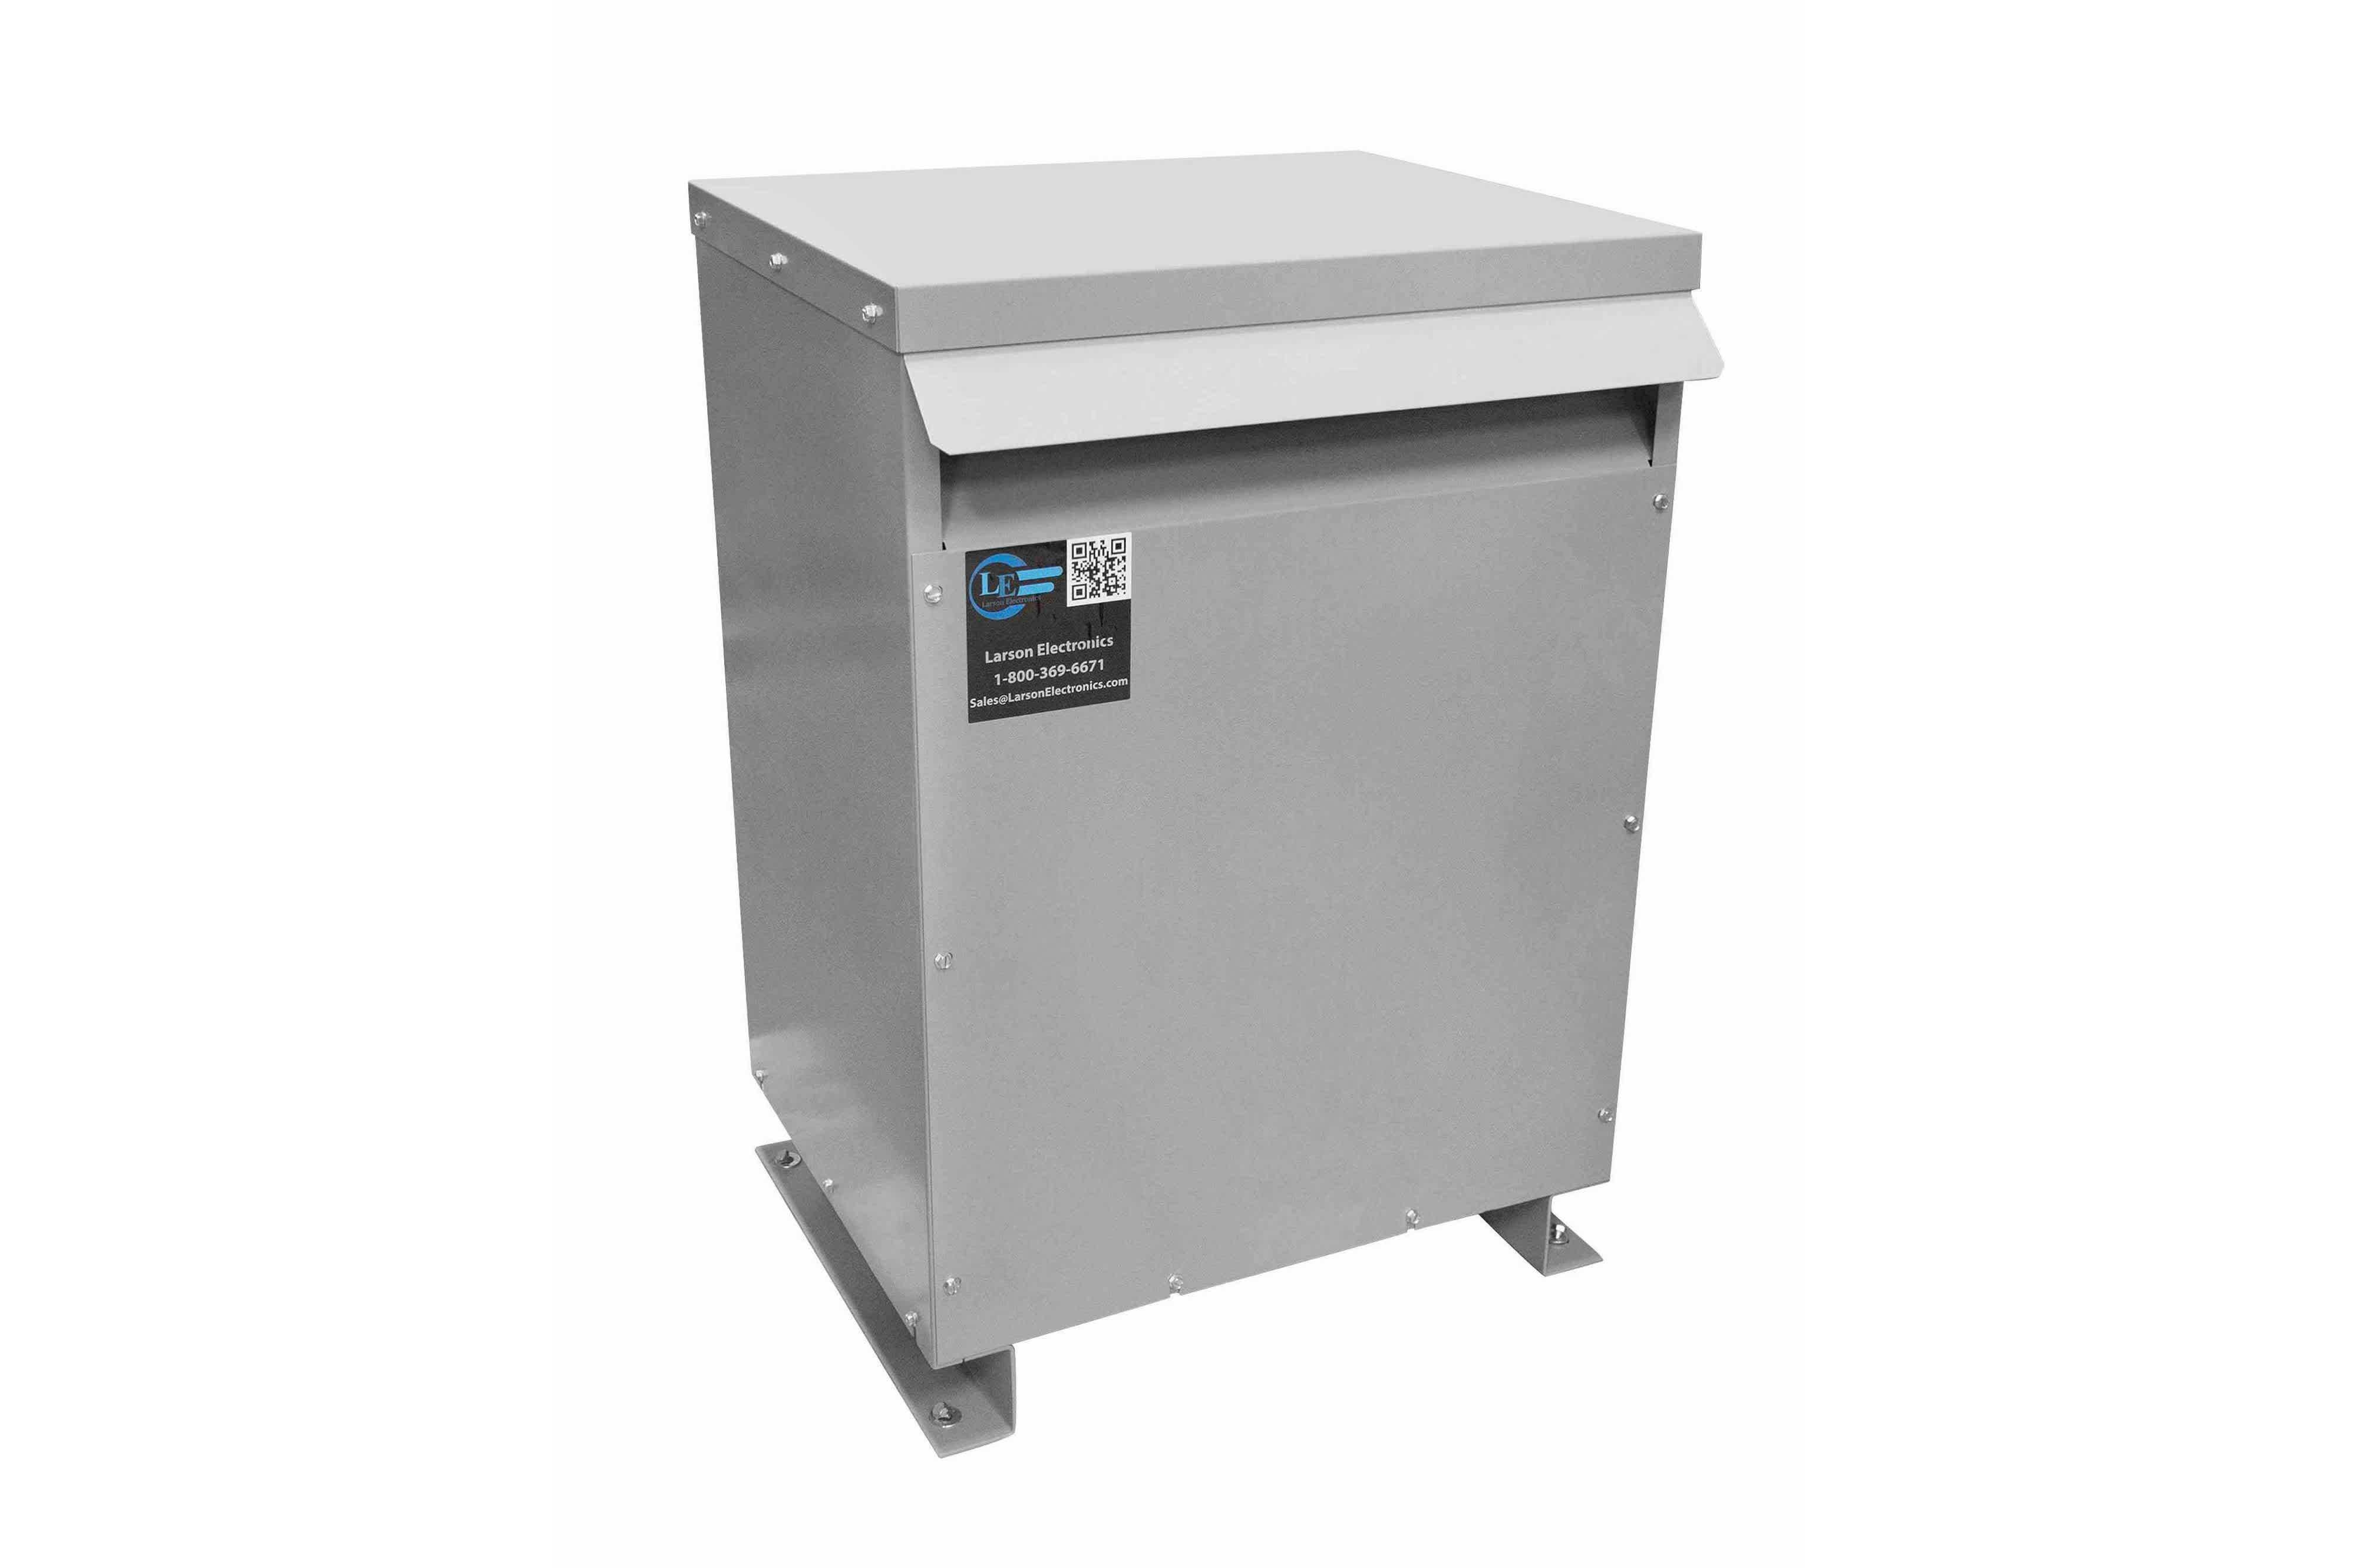 400 kVA 3PH Isolation Transformer, 600V Wye Primary, 380V Delta Secondary, N3R, Ventilated, 60 Hz